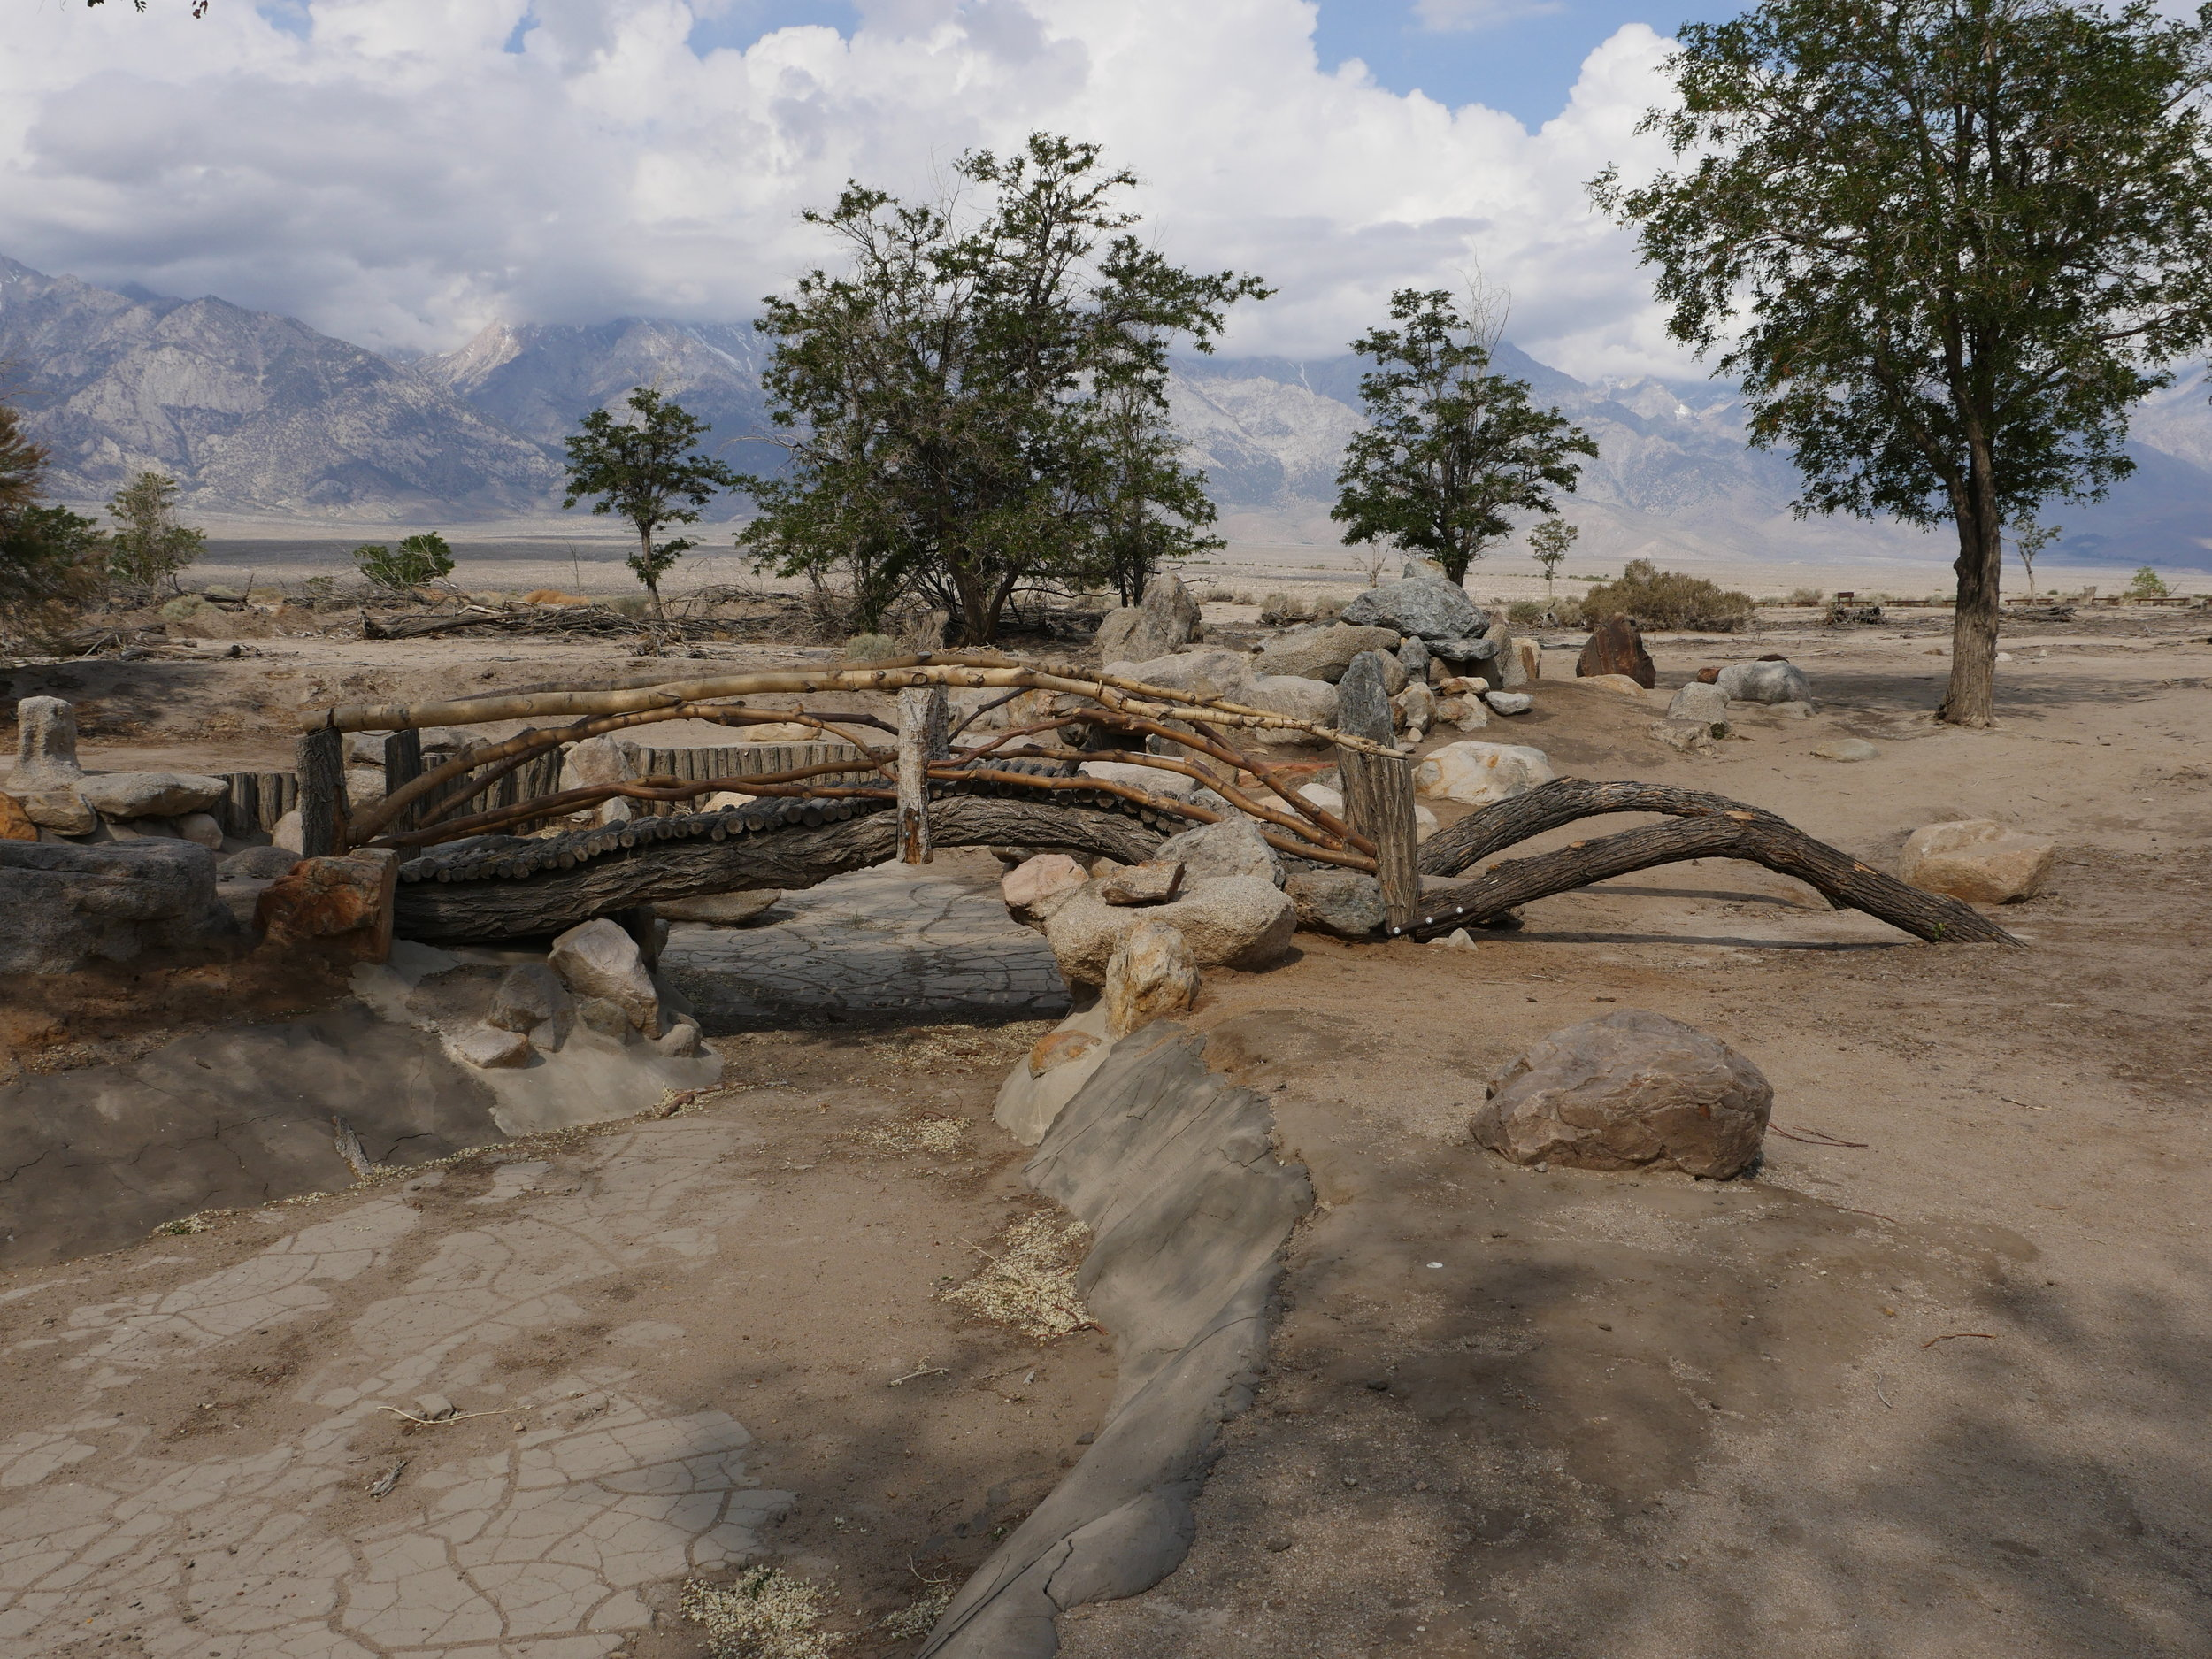 The remains of Merrit Park at Manzanar California (Image  © Anoma Pieris)